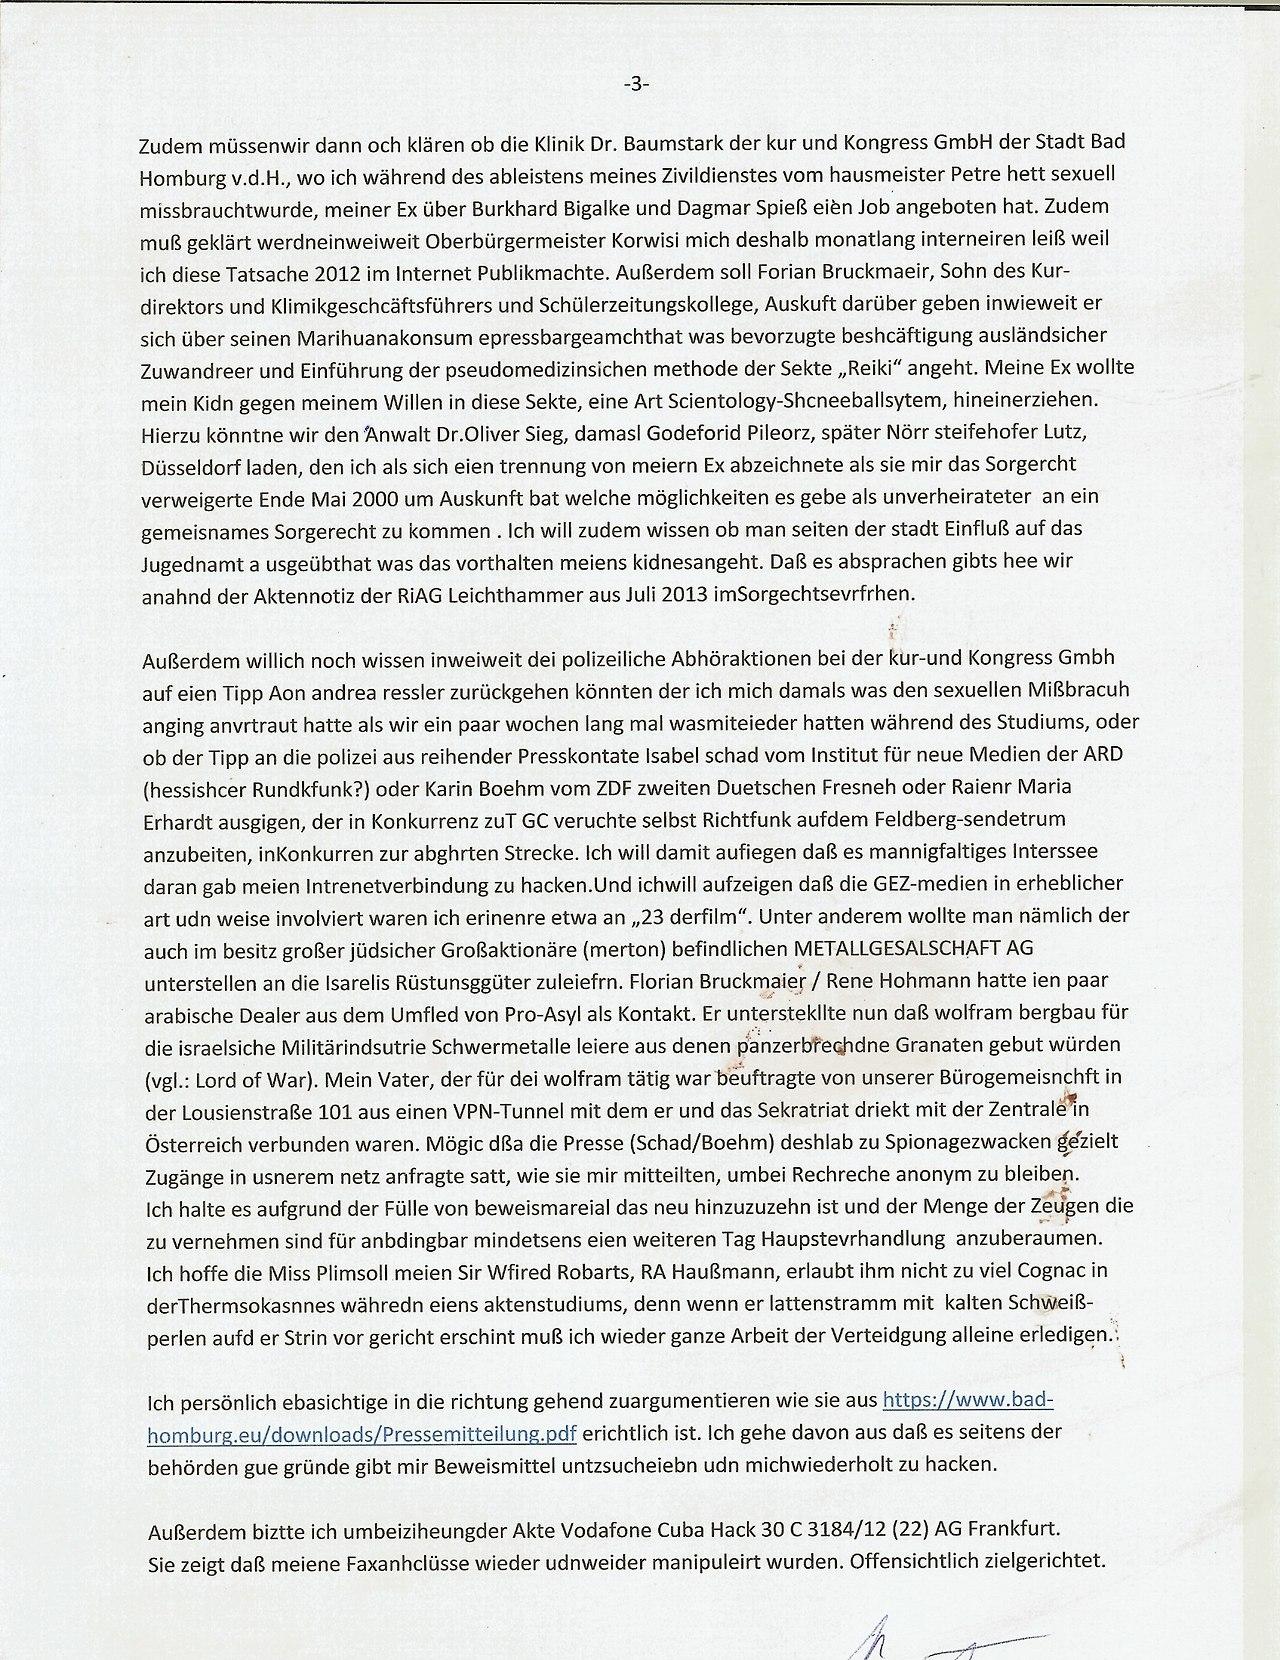 ard mediathek sendung verpasst lindenstraße